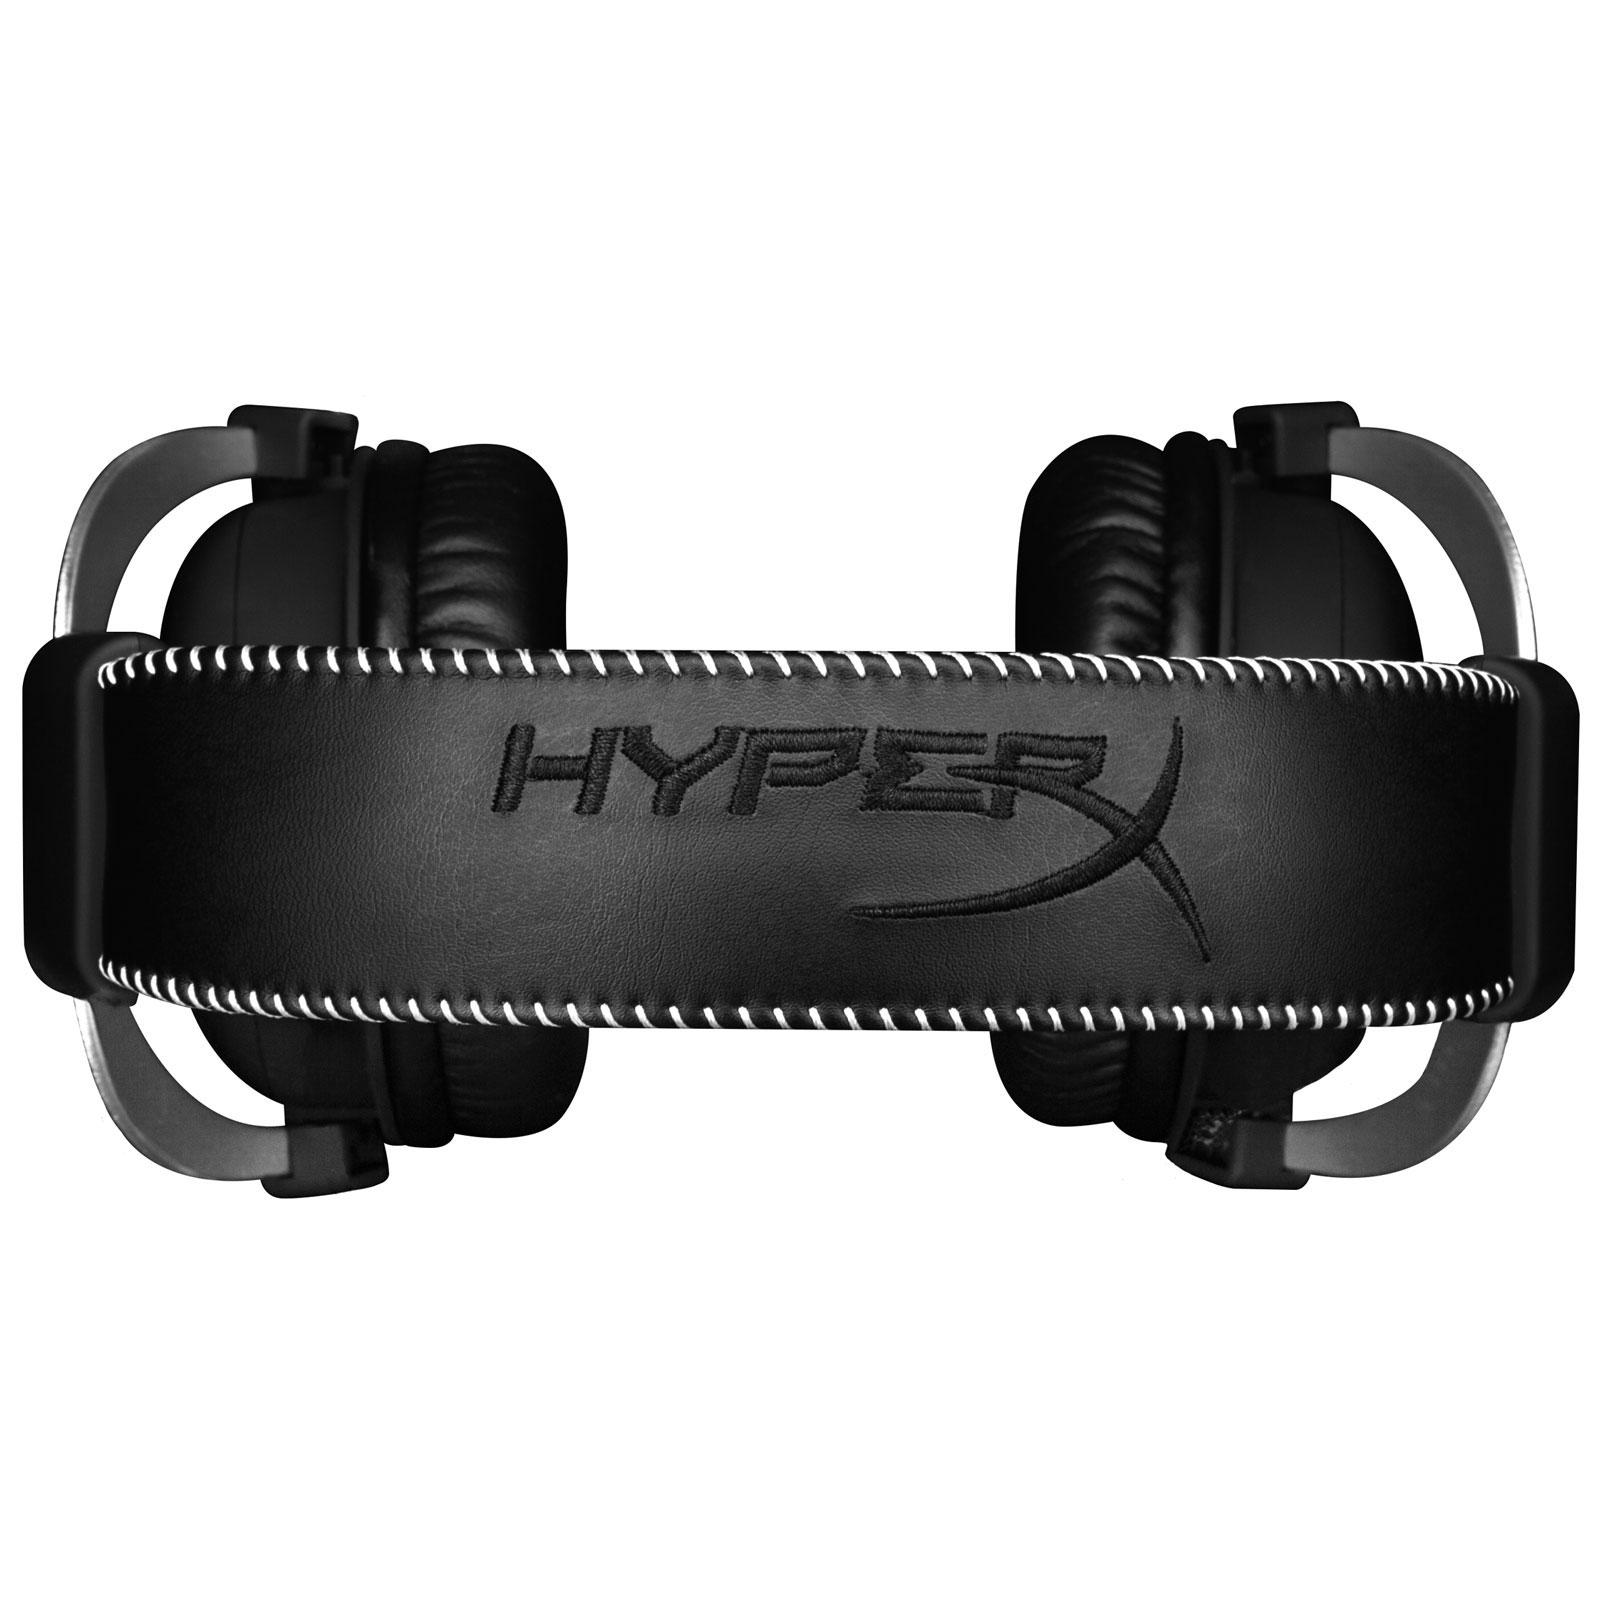 HyperX CloudX Gaming Headset (Silver) (HX-HSCX-SR/EM) - Achat / Vente Micro-casque sur Cybertek.fr - 3